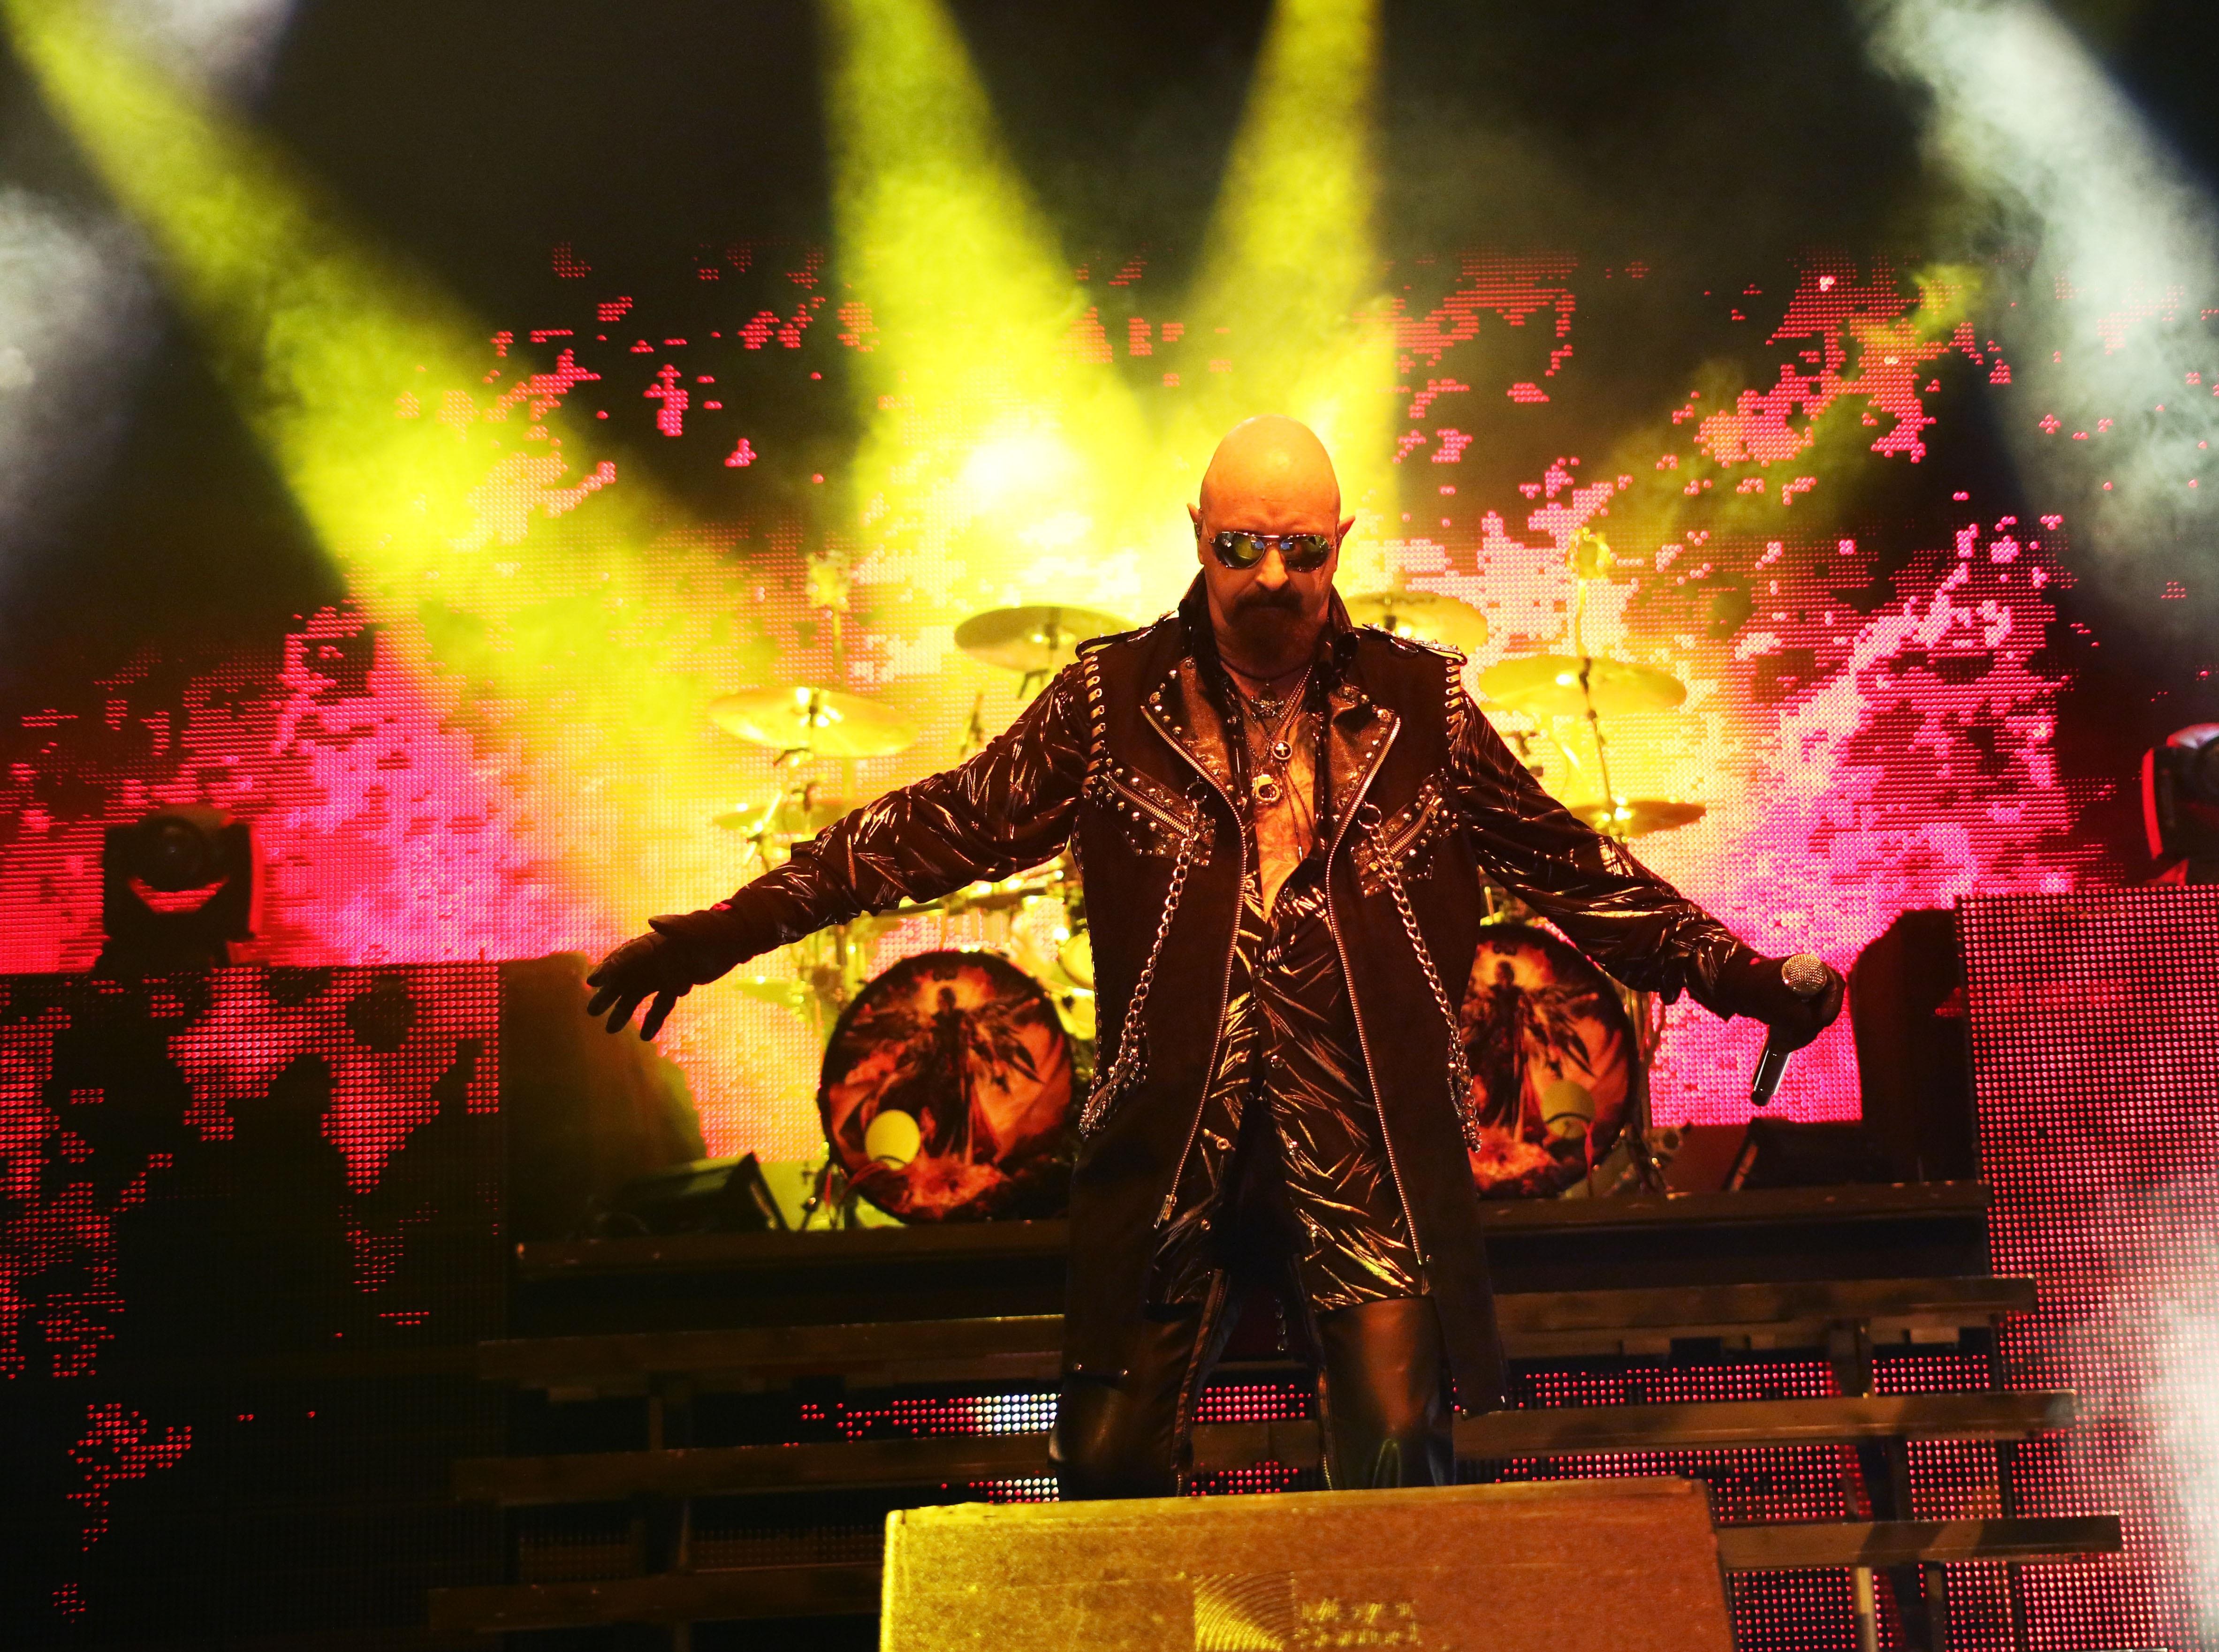 Judas Priest Images